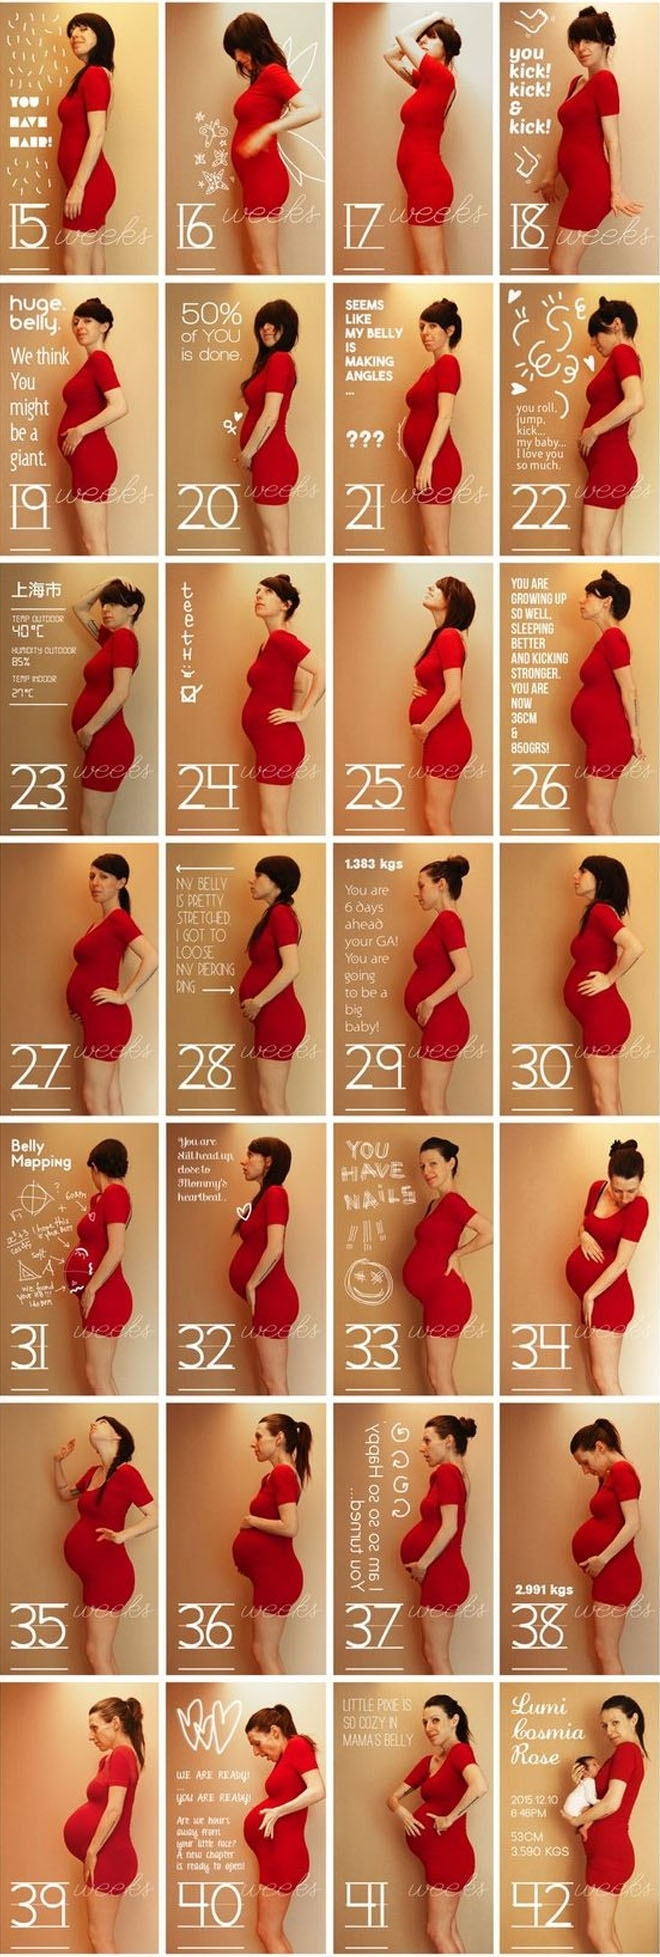 14 Weekly Photo Ideas To Take During Pregnancy | Mum's Grapevine regarding Pregnancy Photos Week By Week